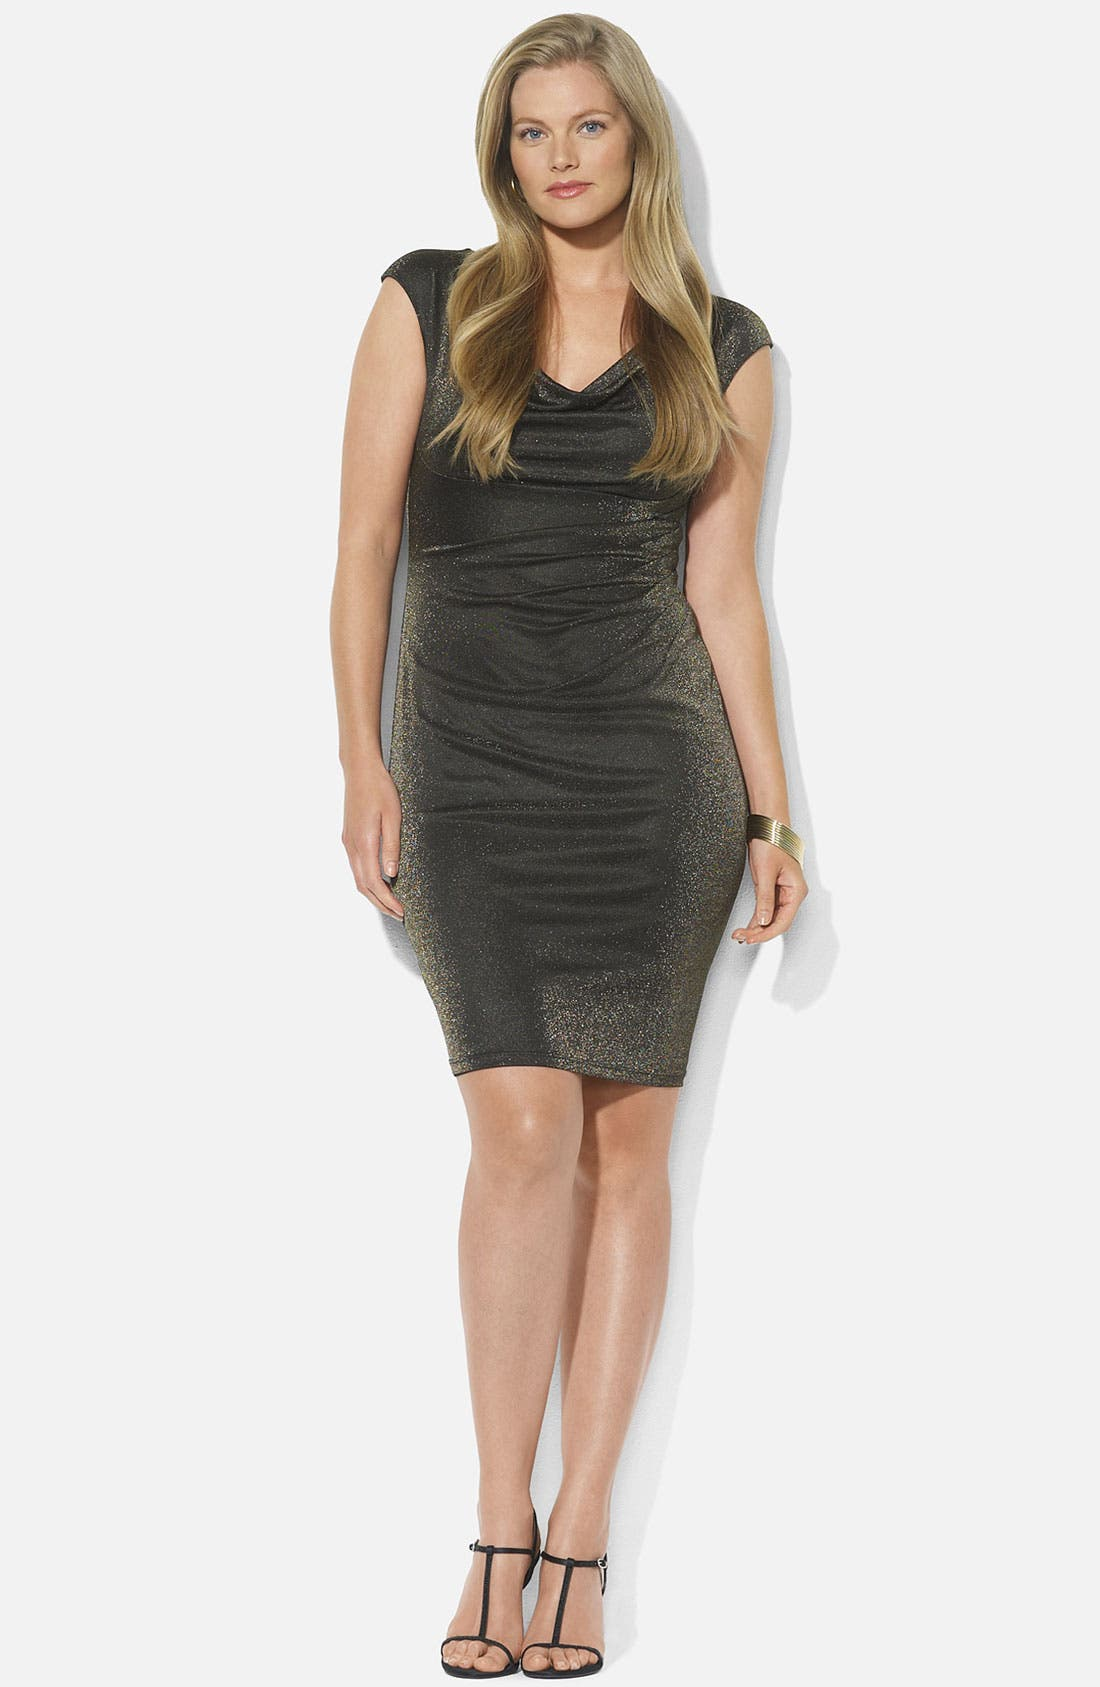 Alternate Image 1 Selected - Lauren Ralph Lauren Metallic Knit Sheath Dress (Plus)